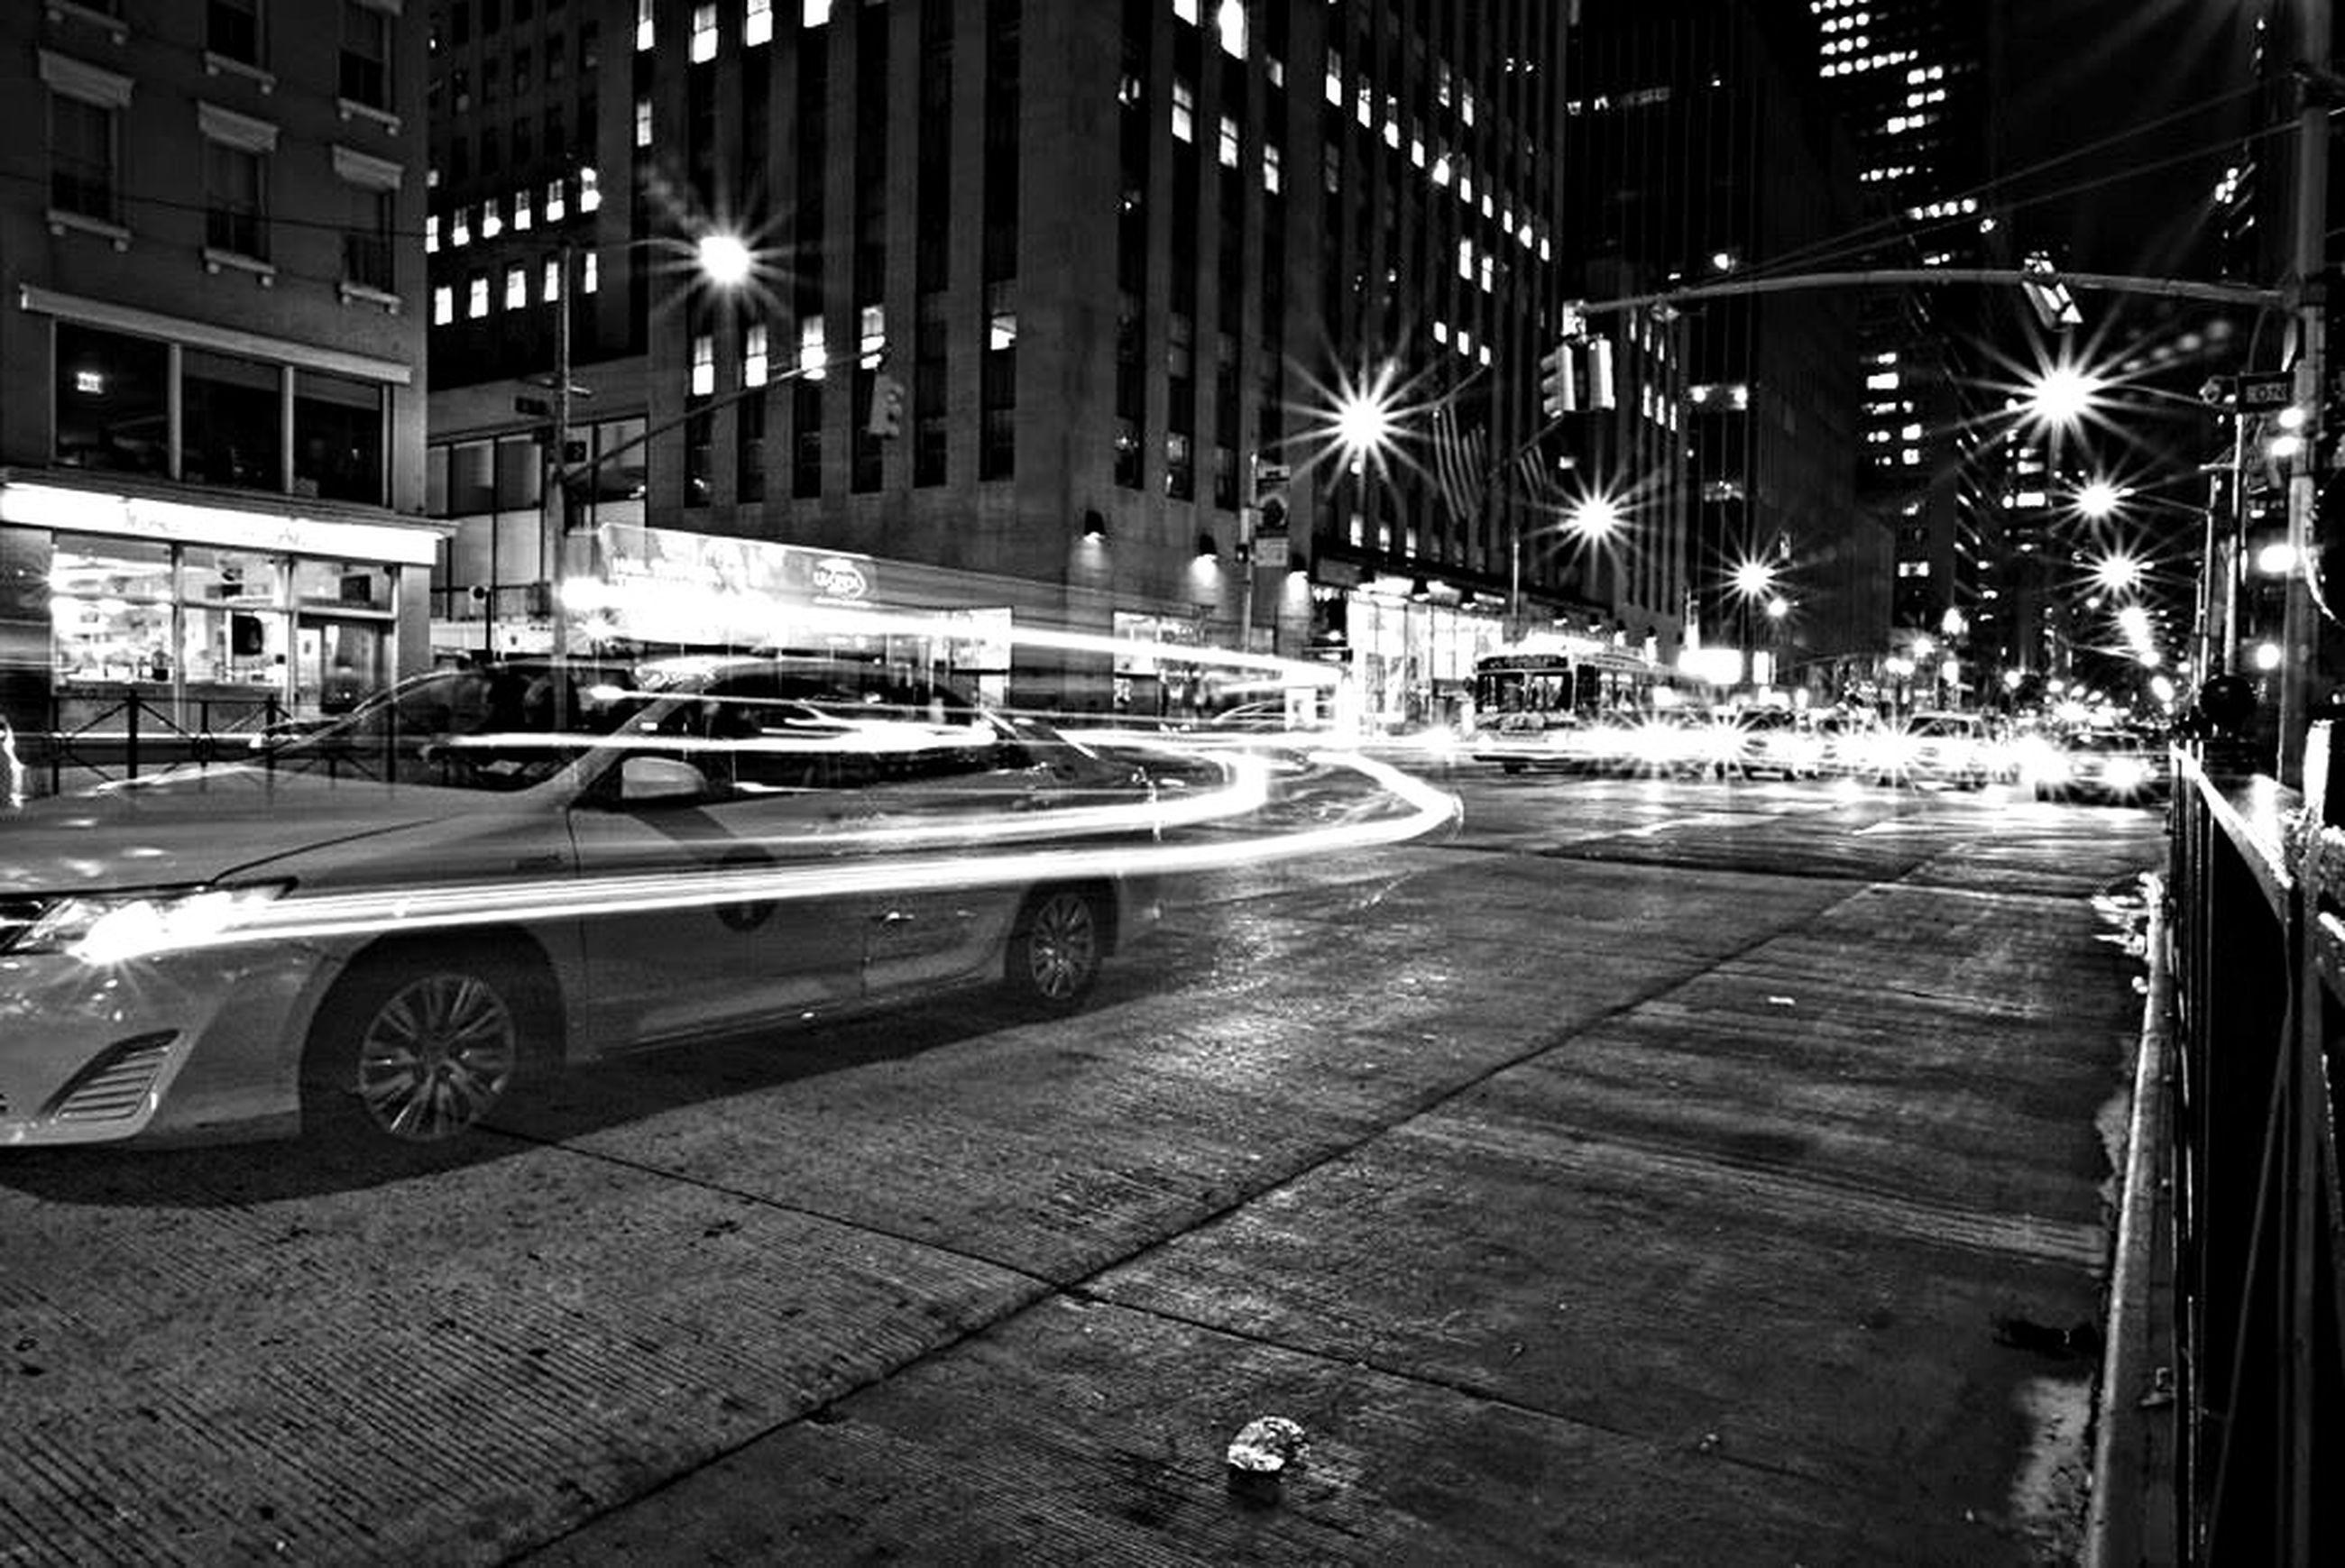 night, illuminated, transportation, street, land vehicle, building exterior, mode of transport, car, city, street light, architecture, built structure, city street, road, lighting equipment, sidewalk, city life, outdoors, incidental people, motion